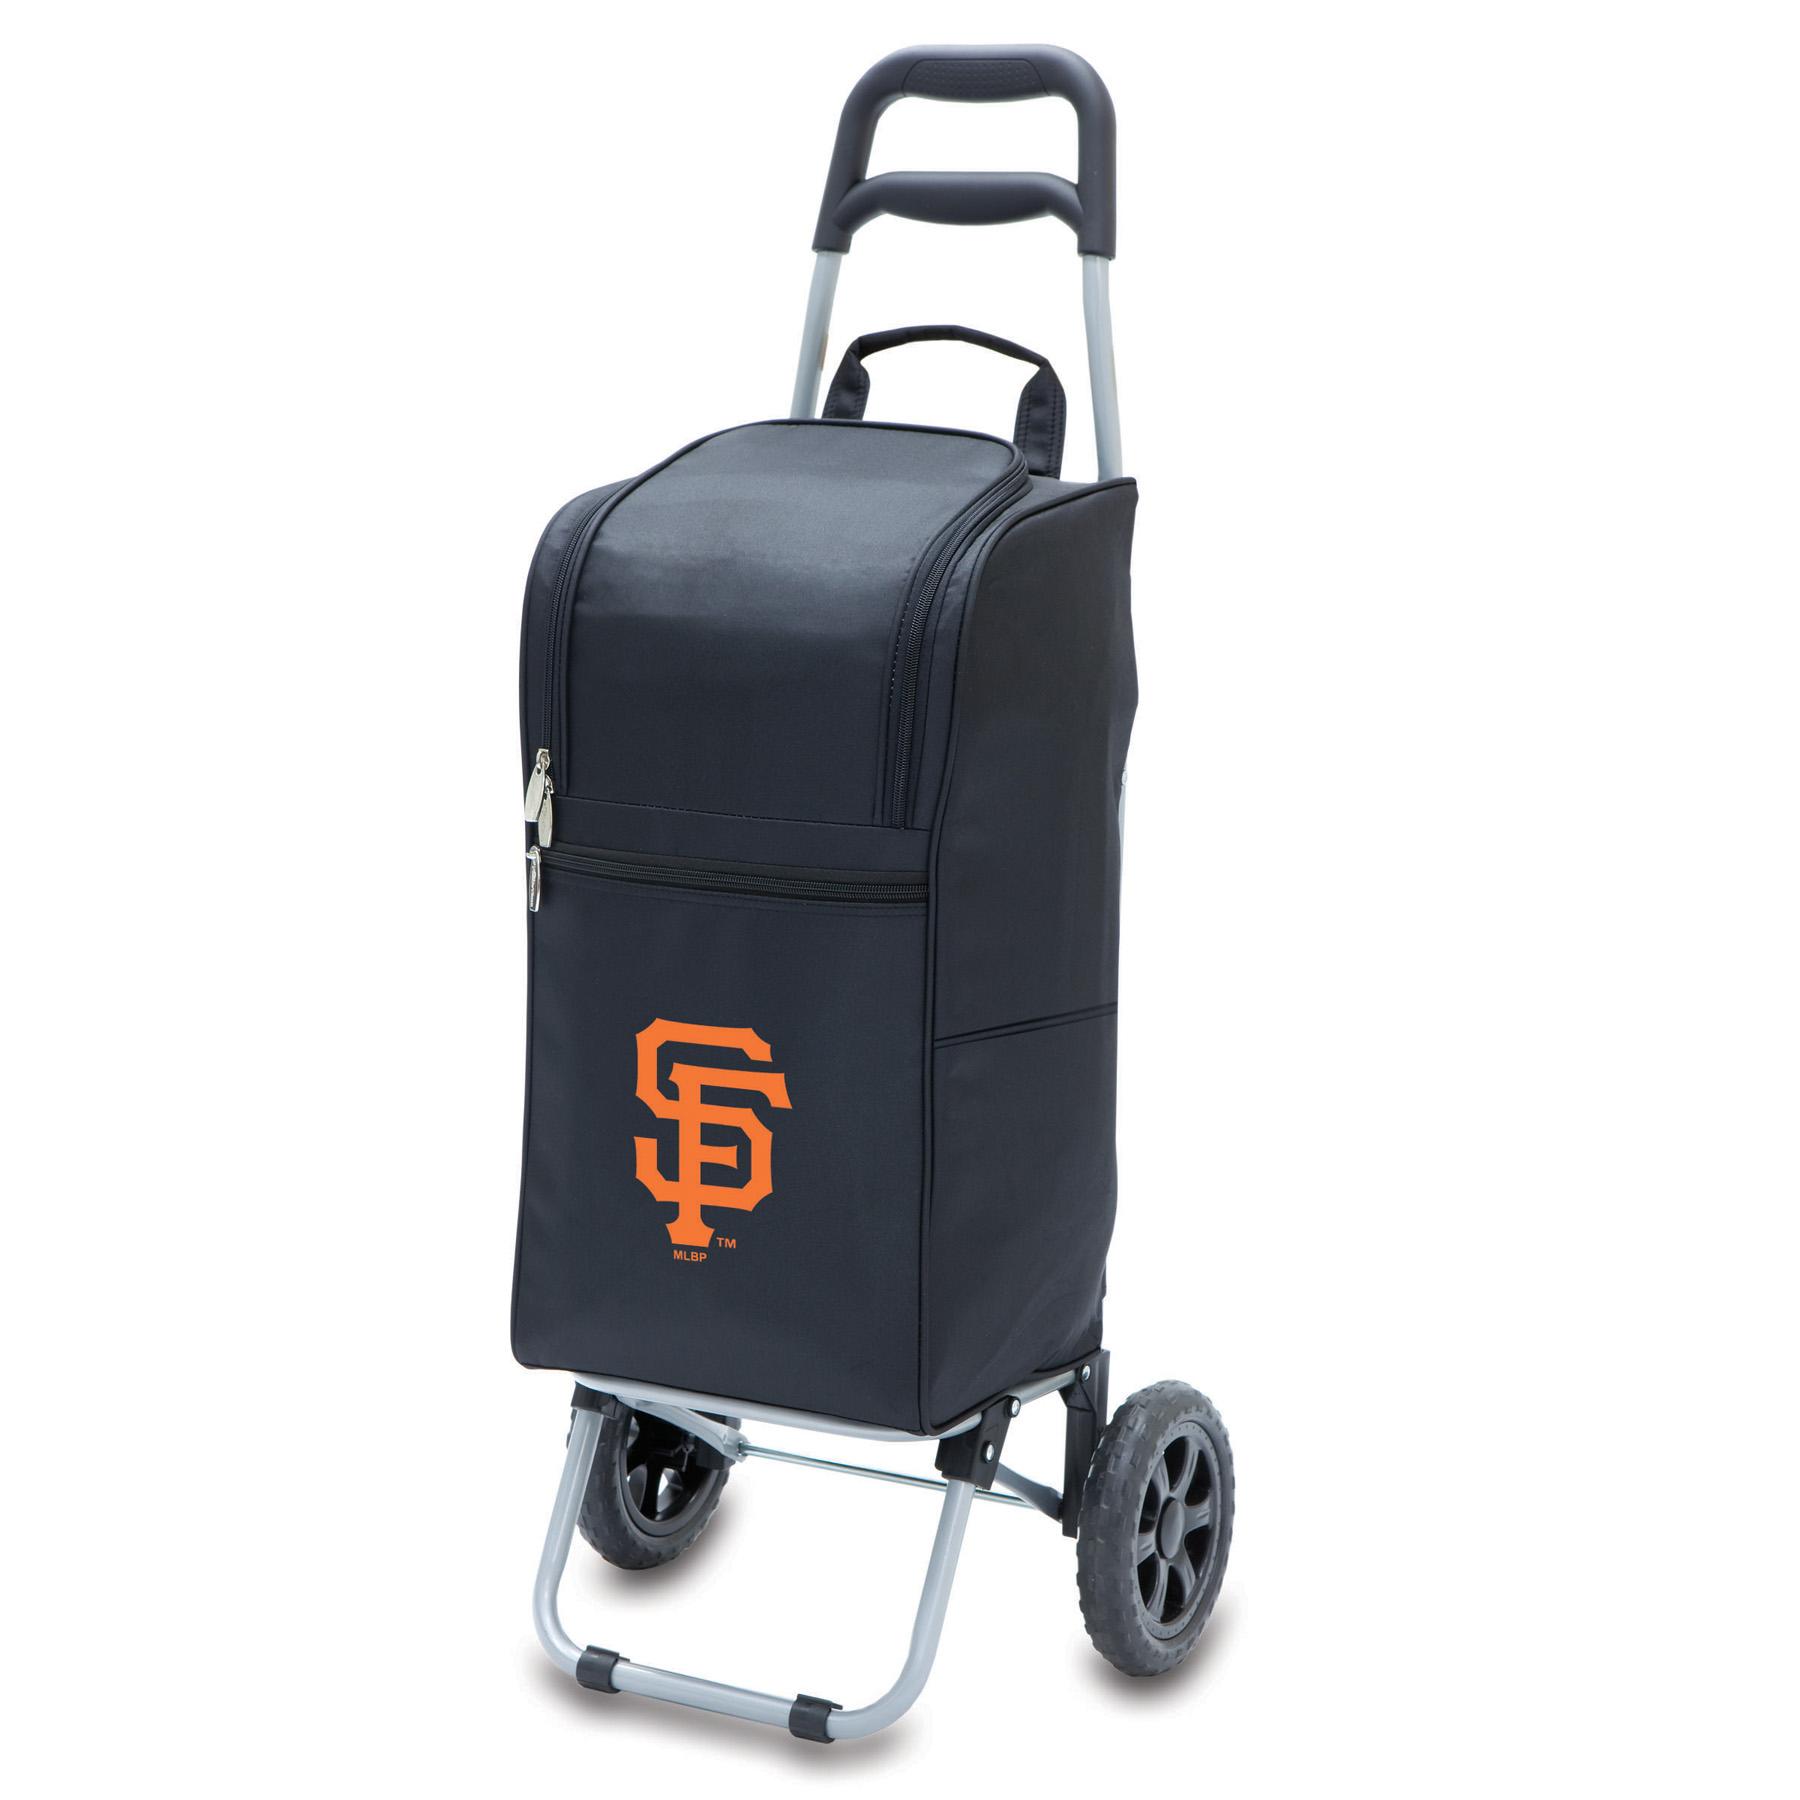 Picnic Time Cart Cooler - MLB - Black